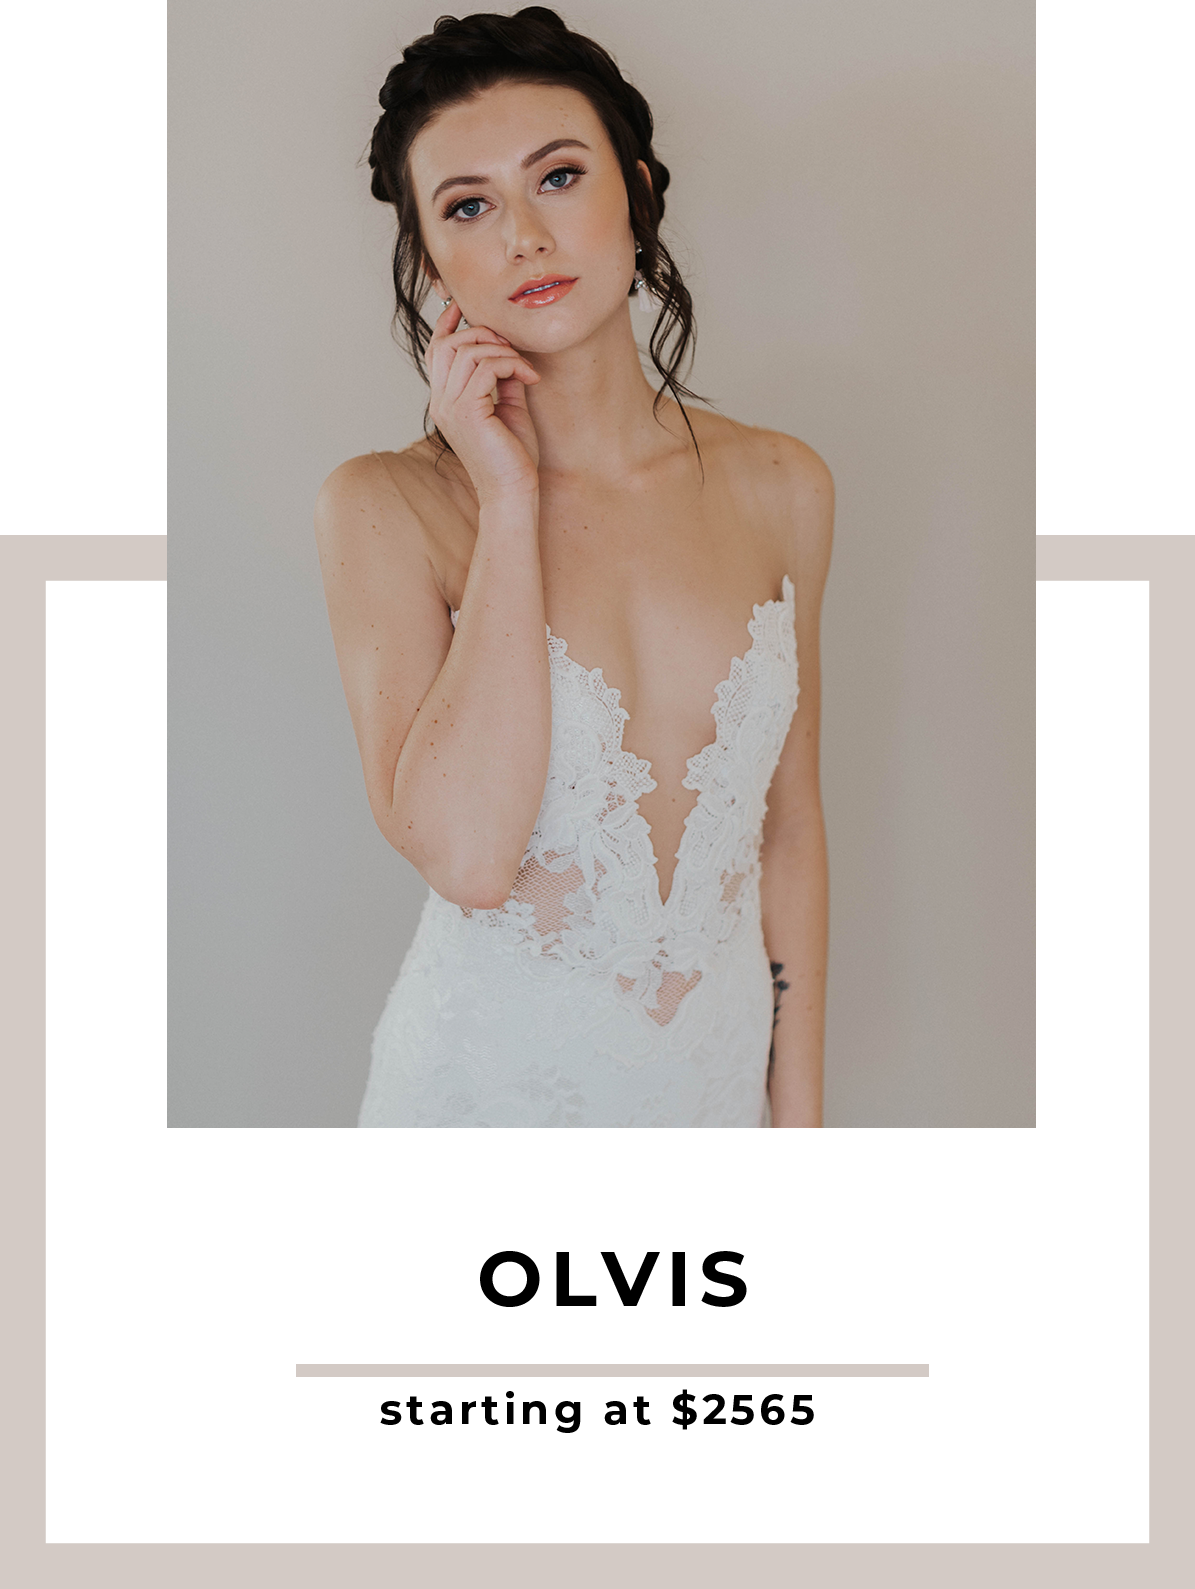 Olvis_wedding_dress.png